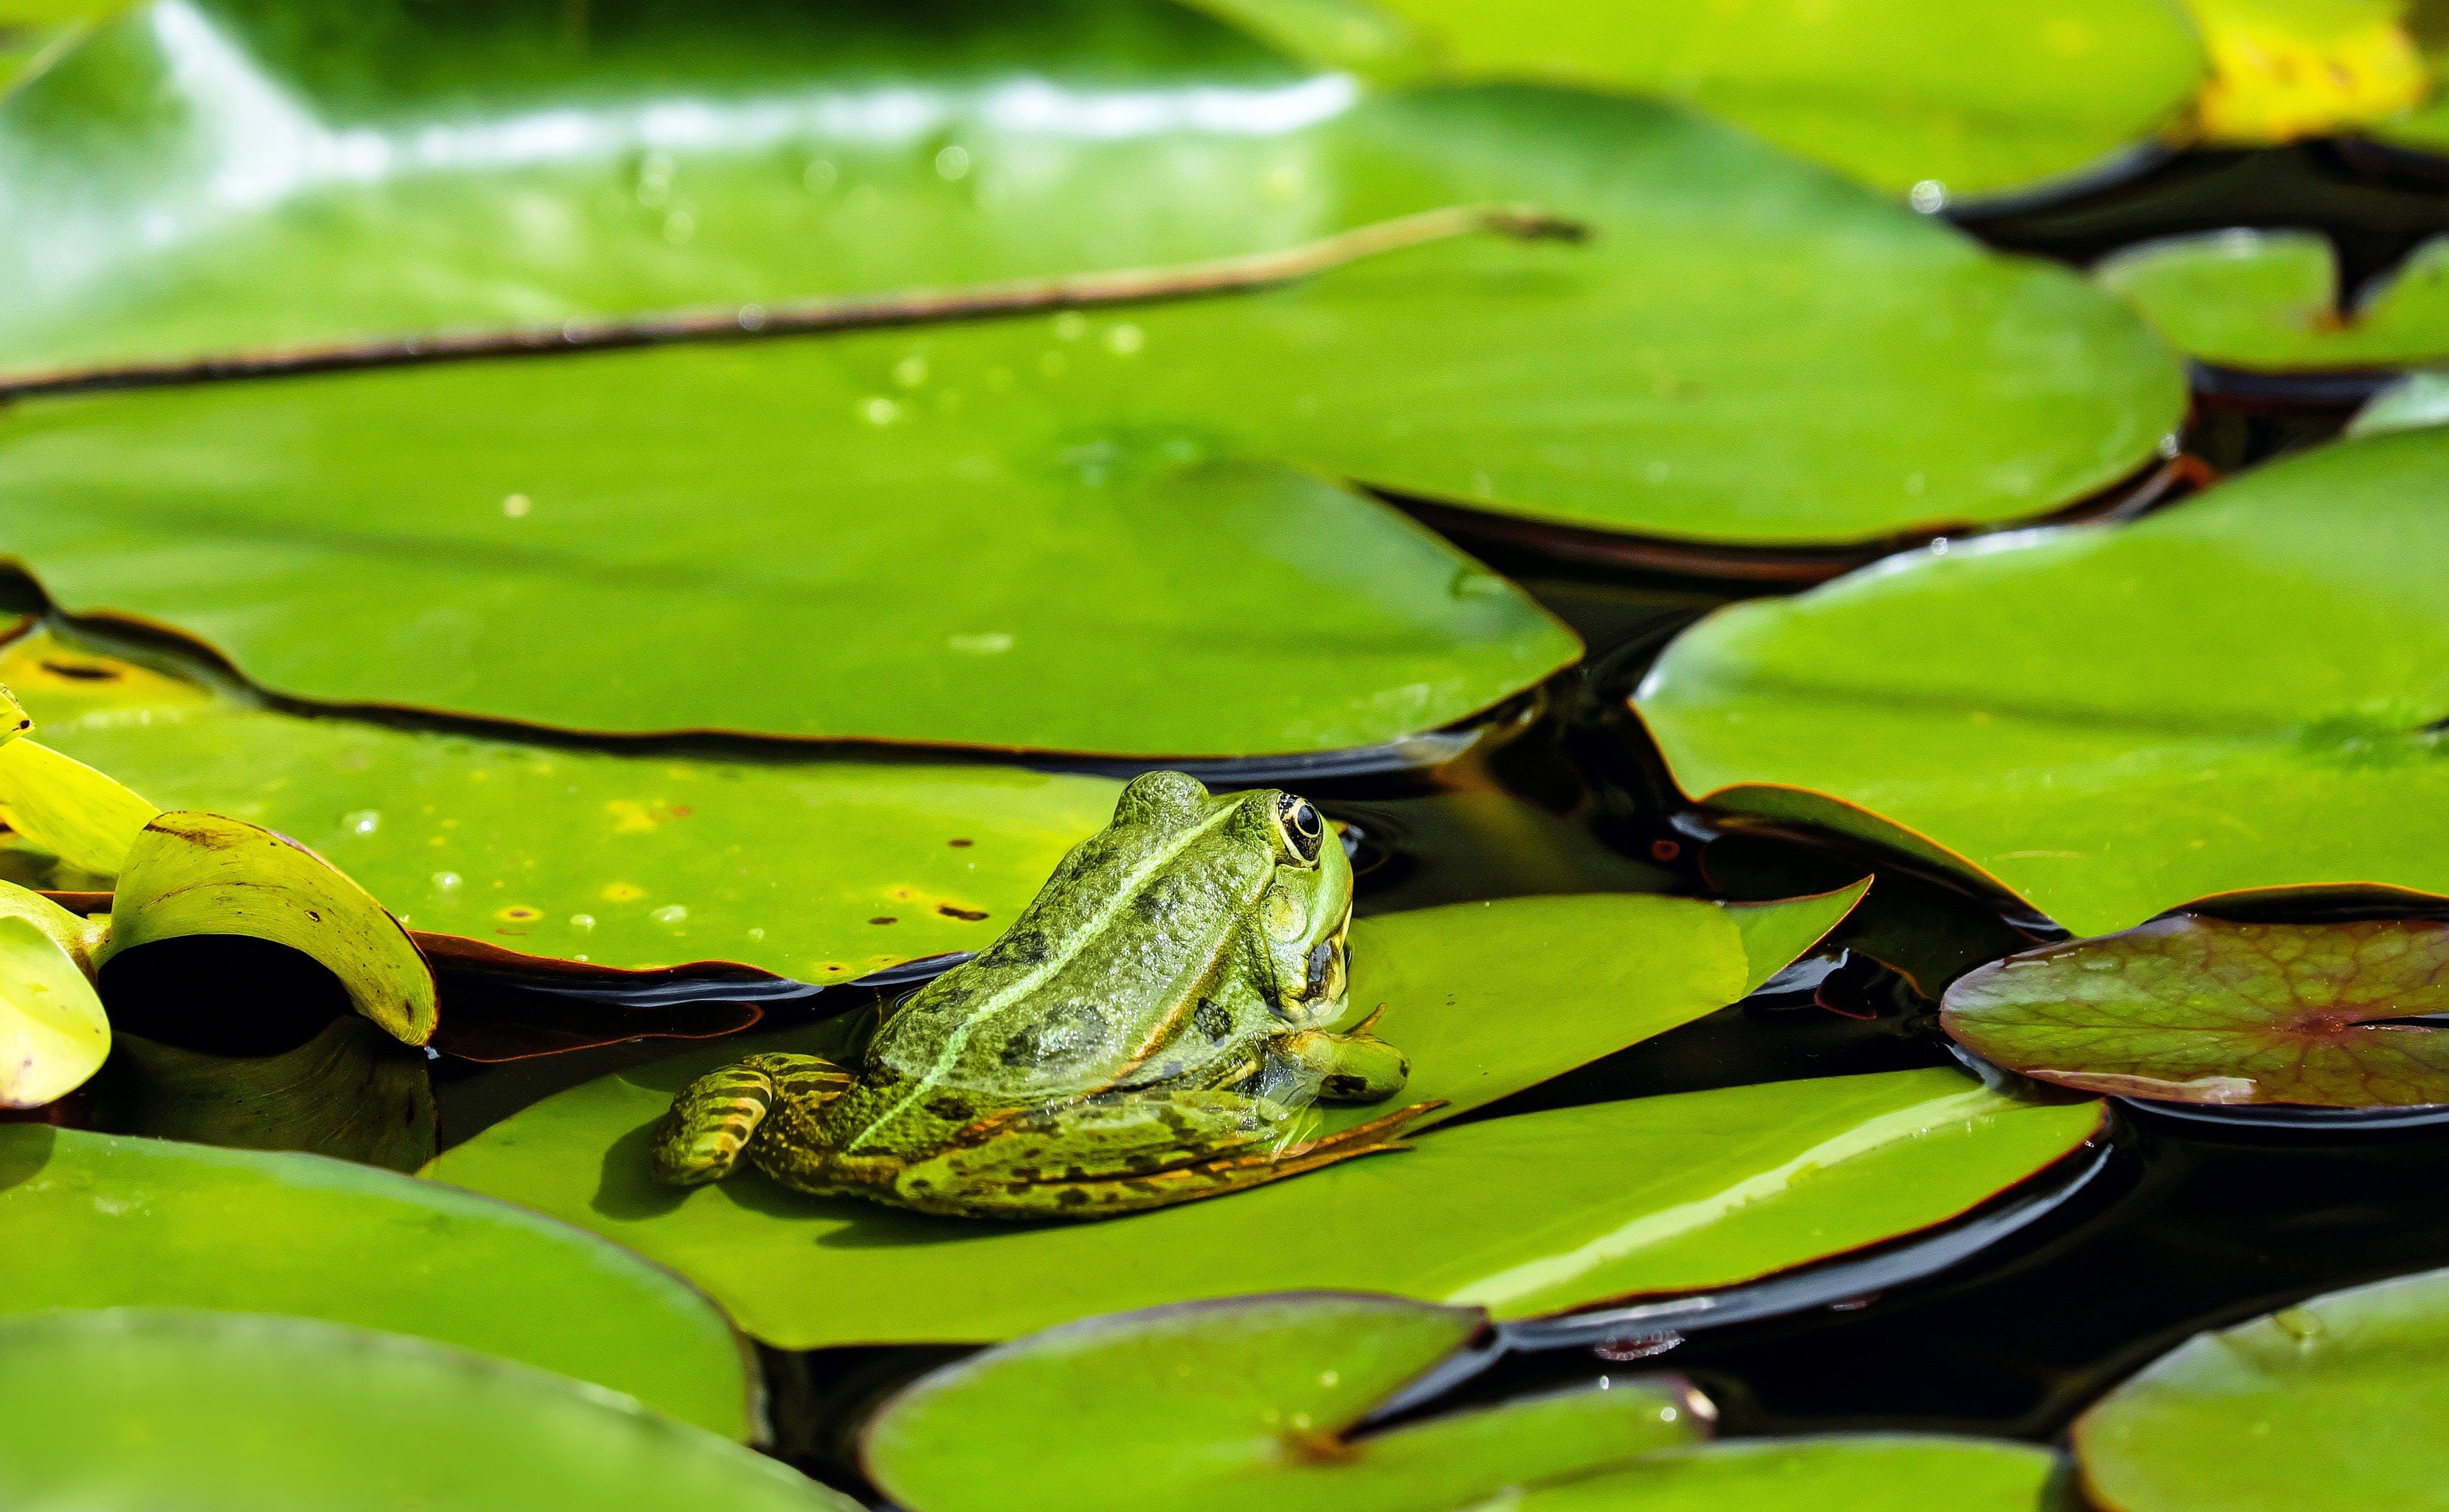 Kostnadsfri bild av amfibie, djur, flora, groda